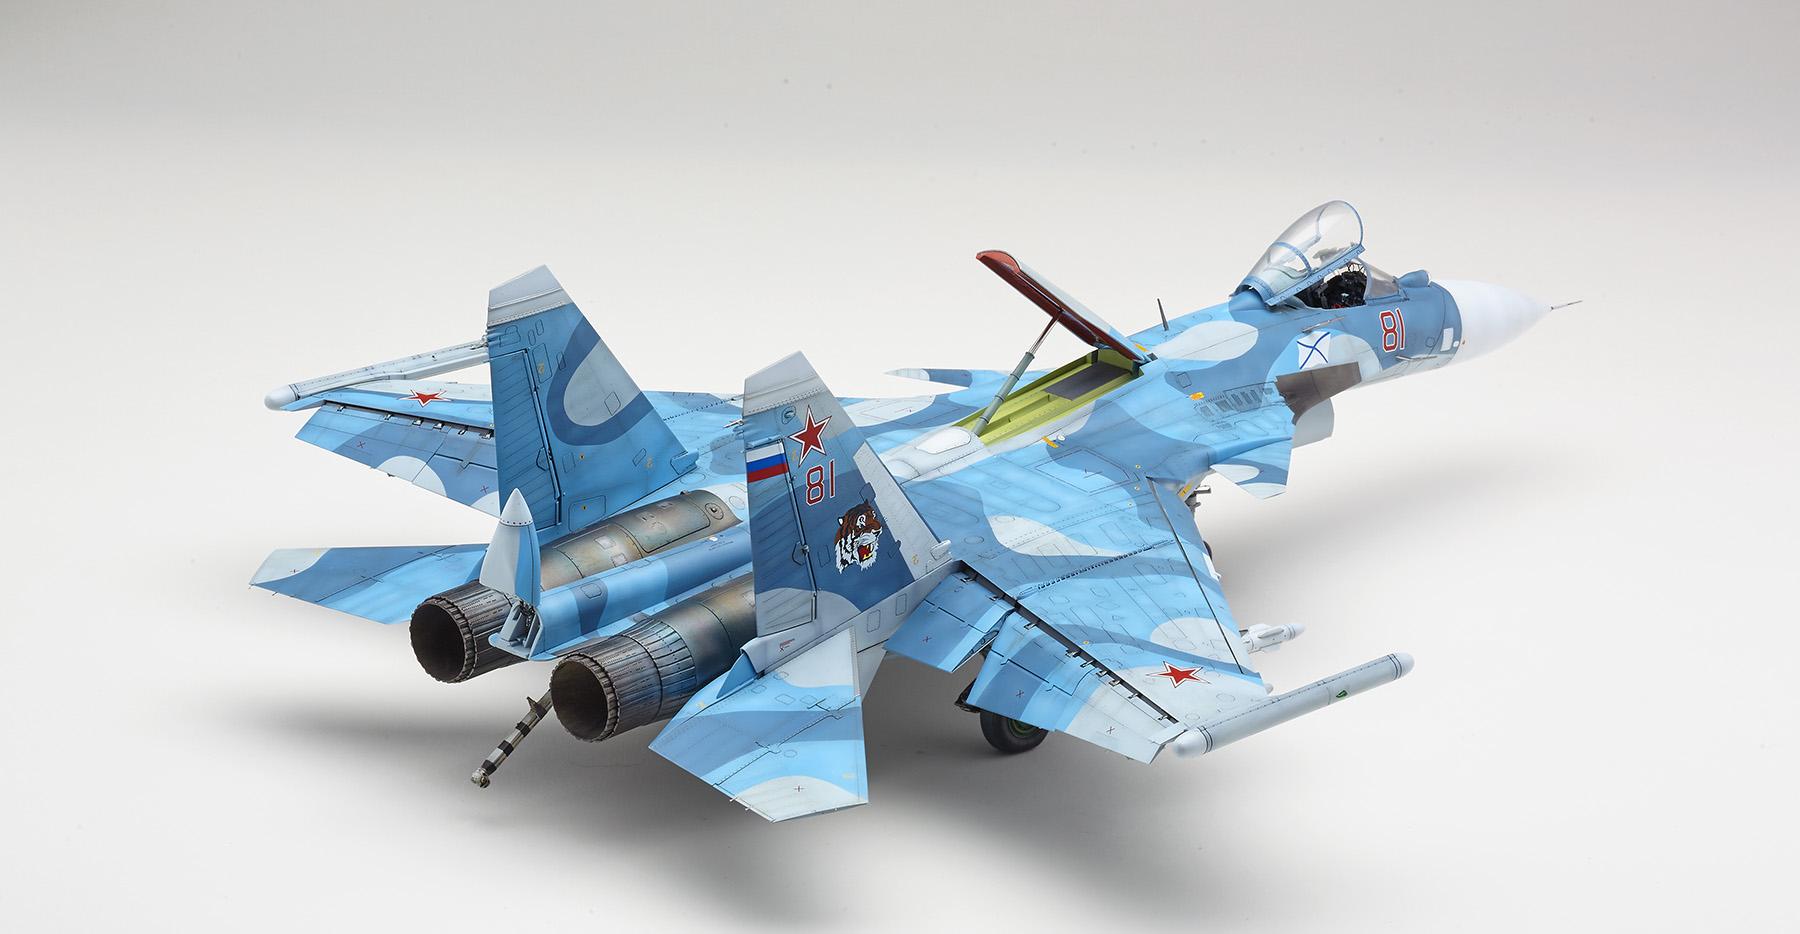 1/48 Kinetic Su-33